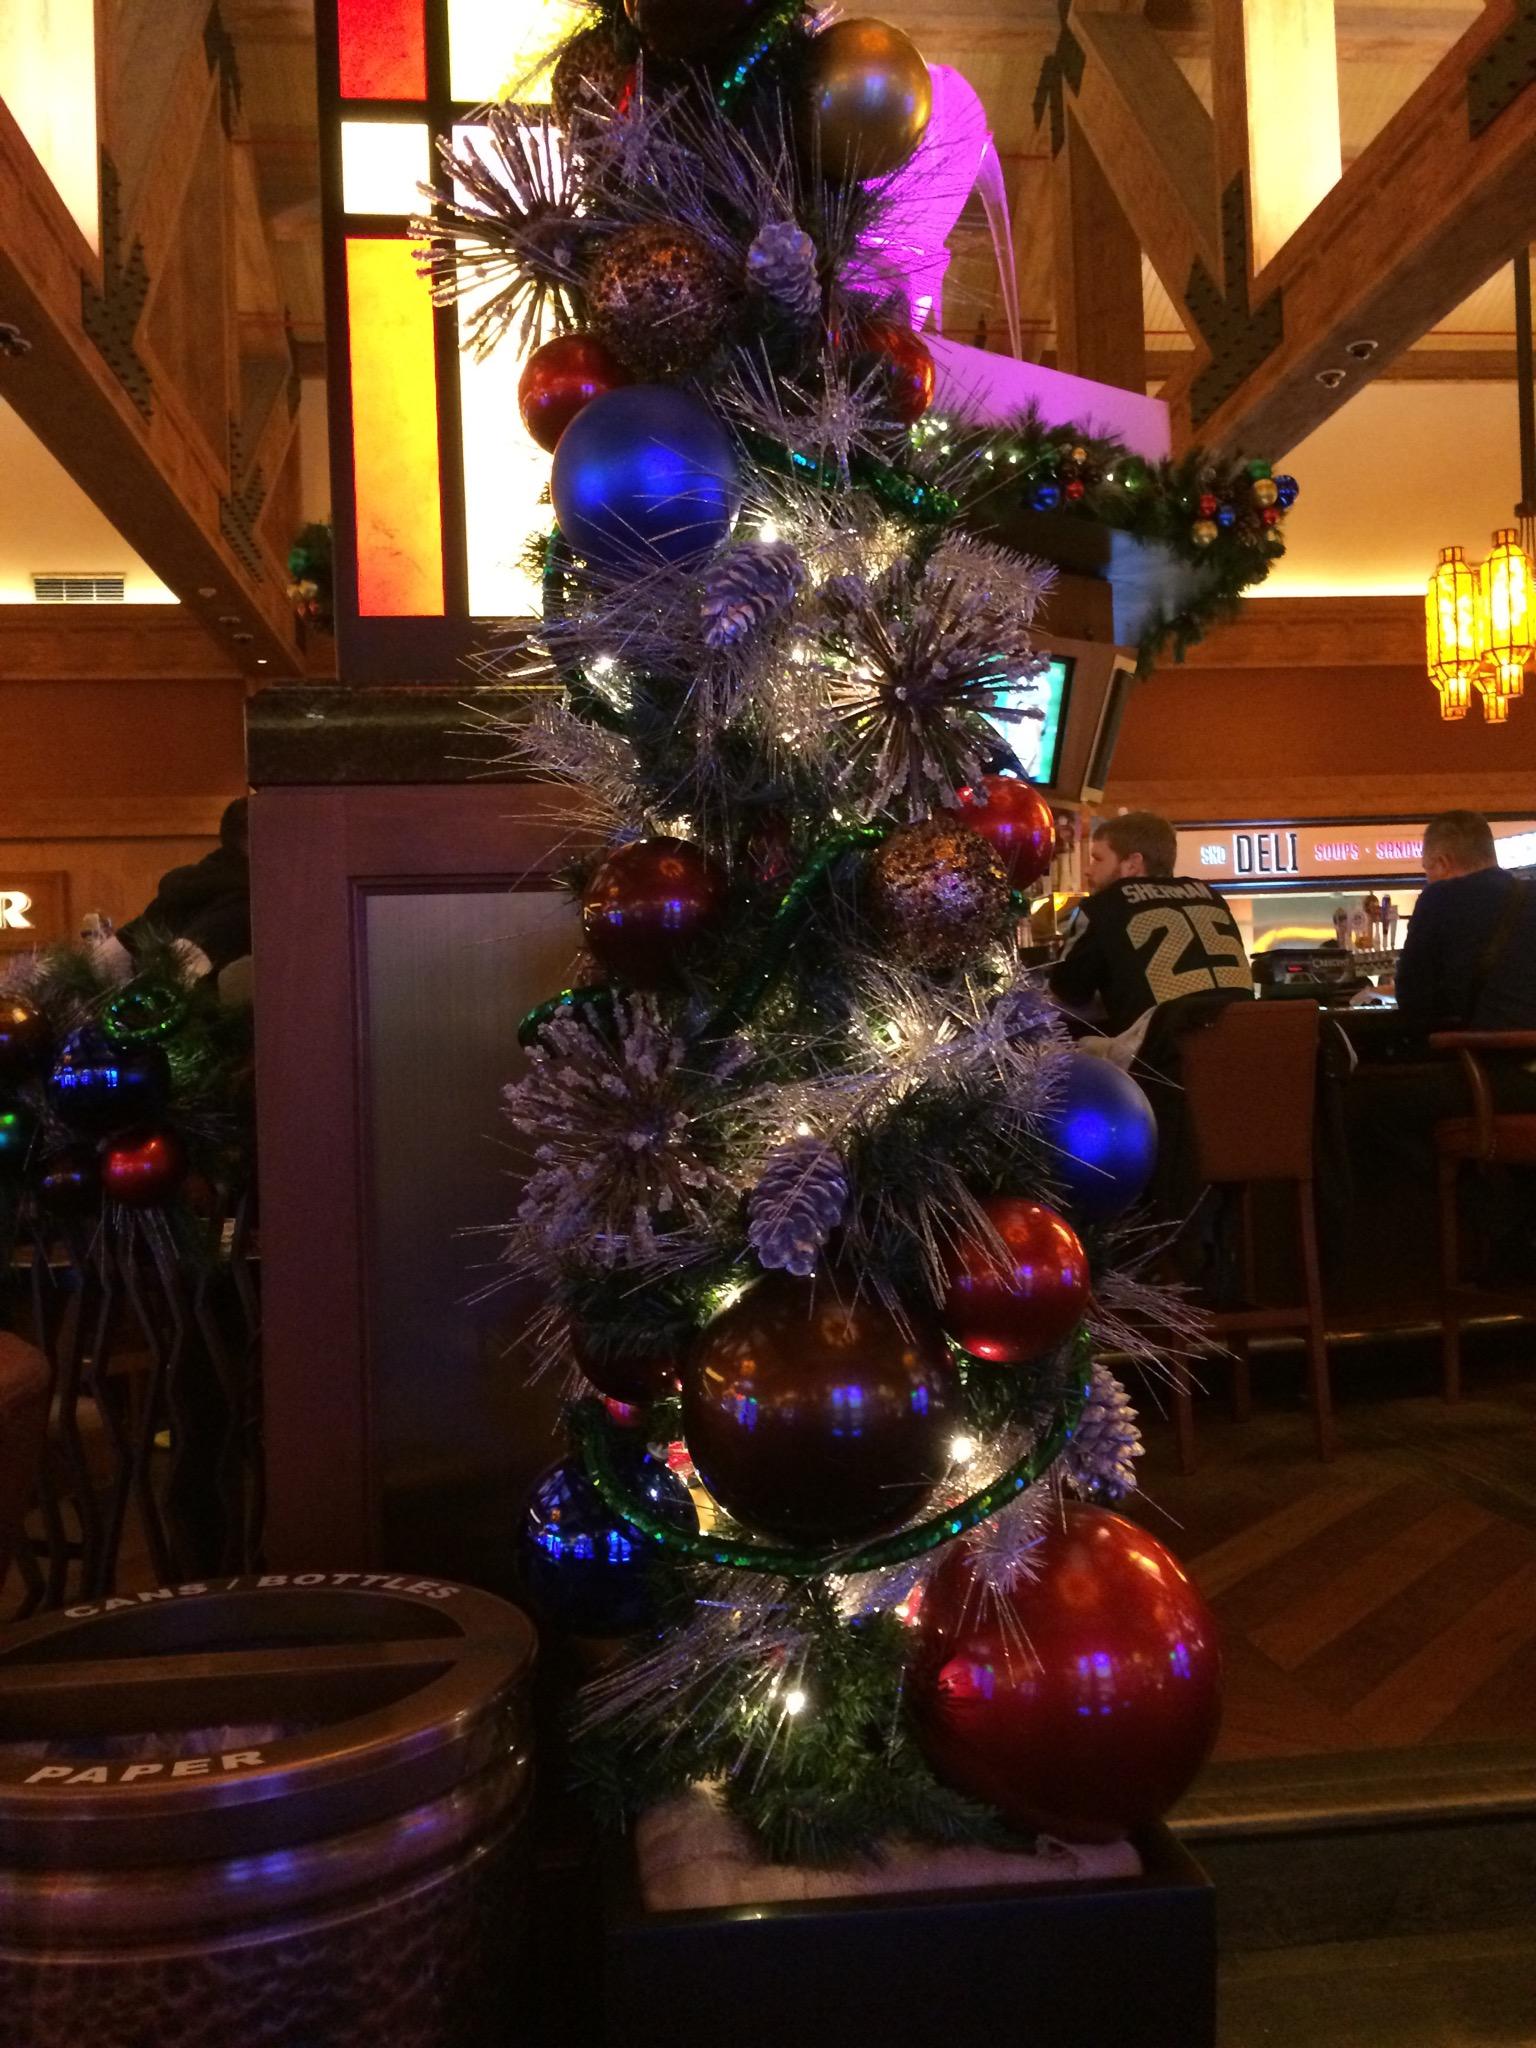 Casino Decorations A Very Atheist Christmas